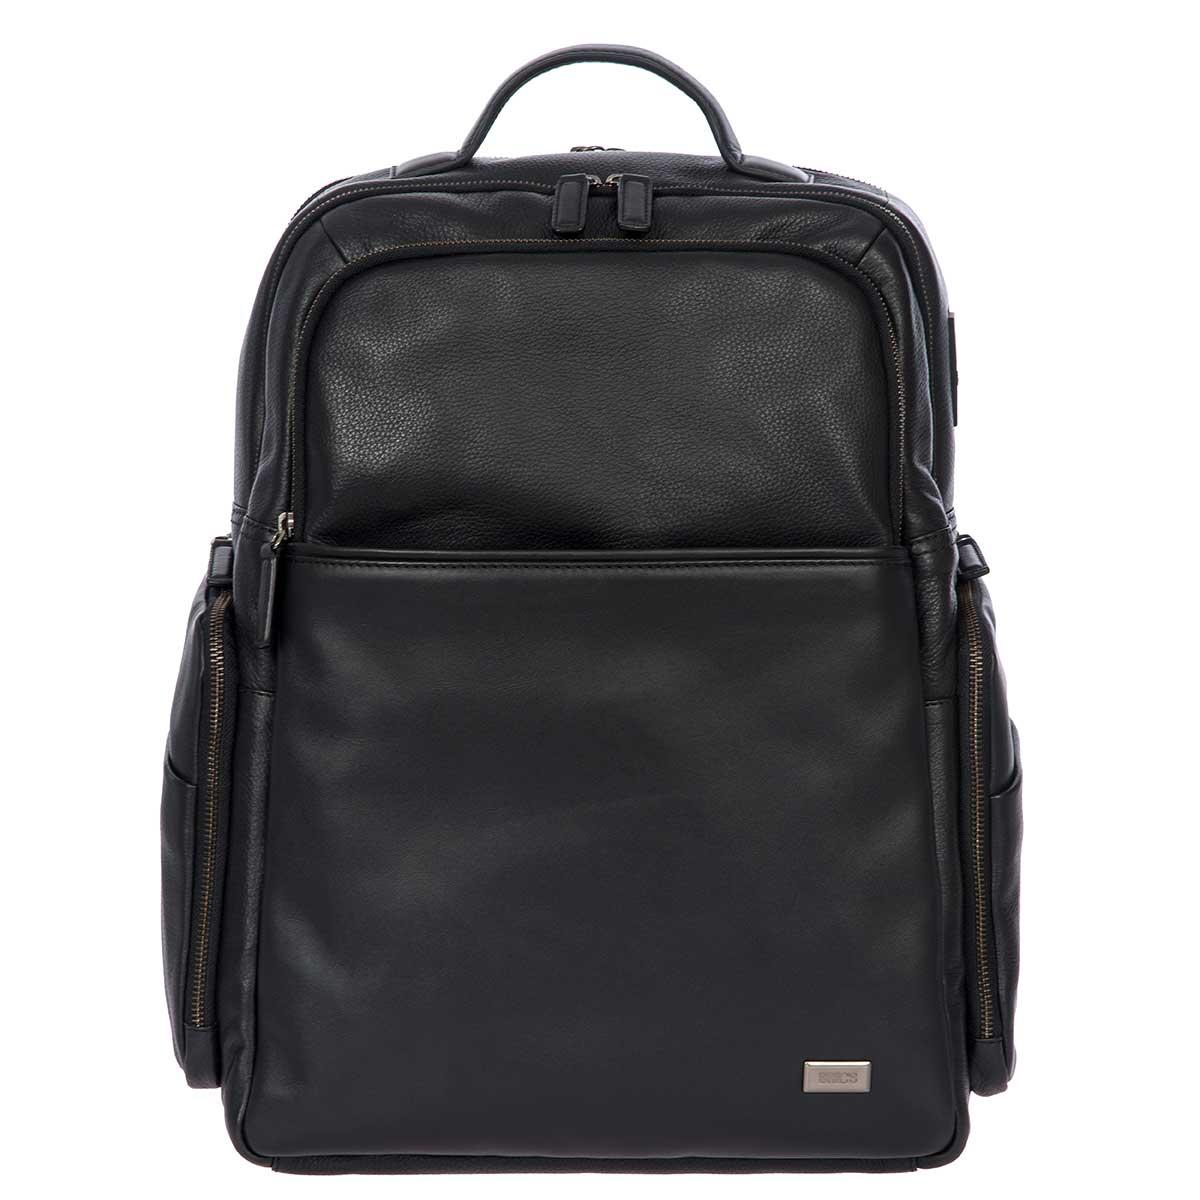 df232a7a1e0b Torino Large Business Backpack – Black